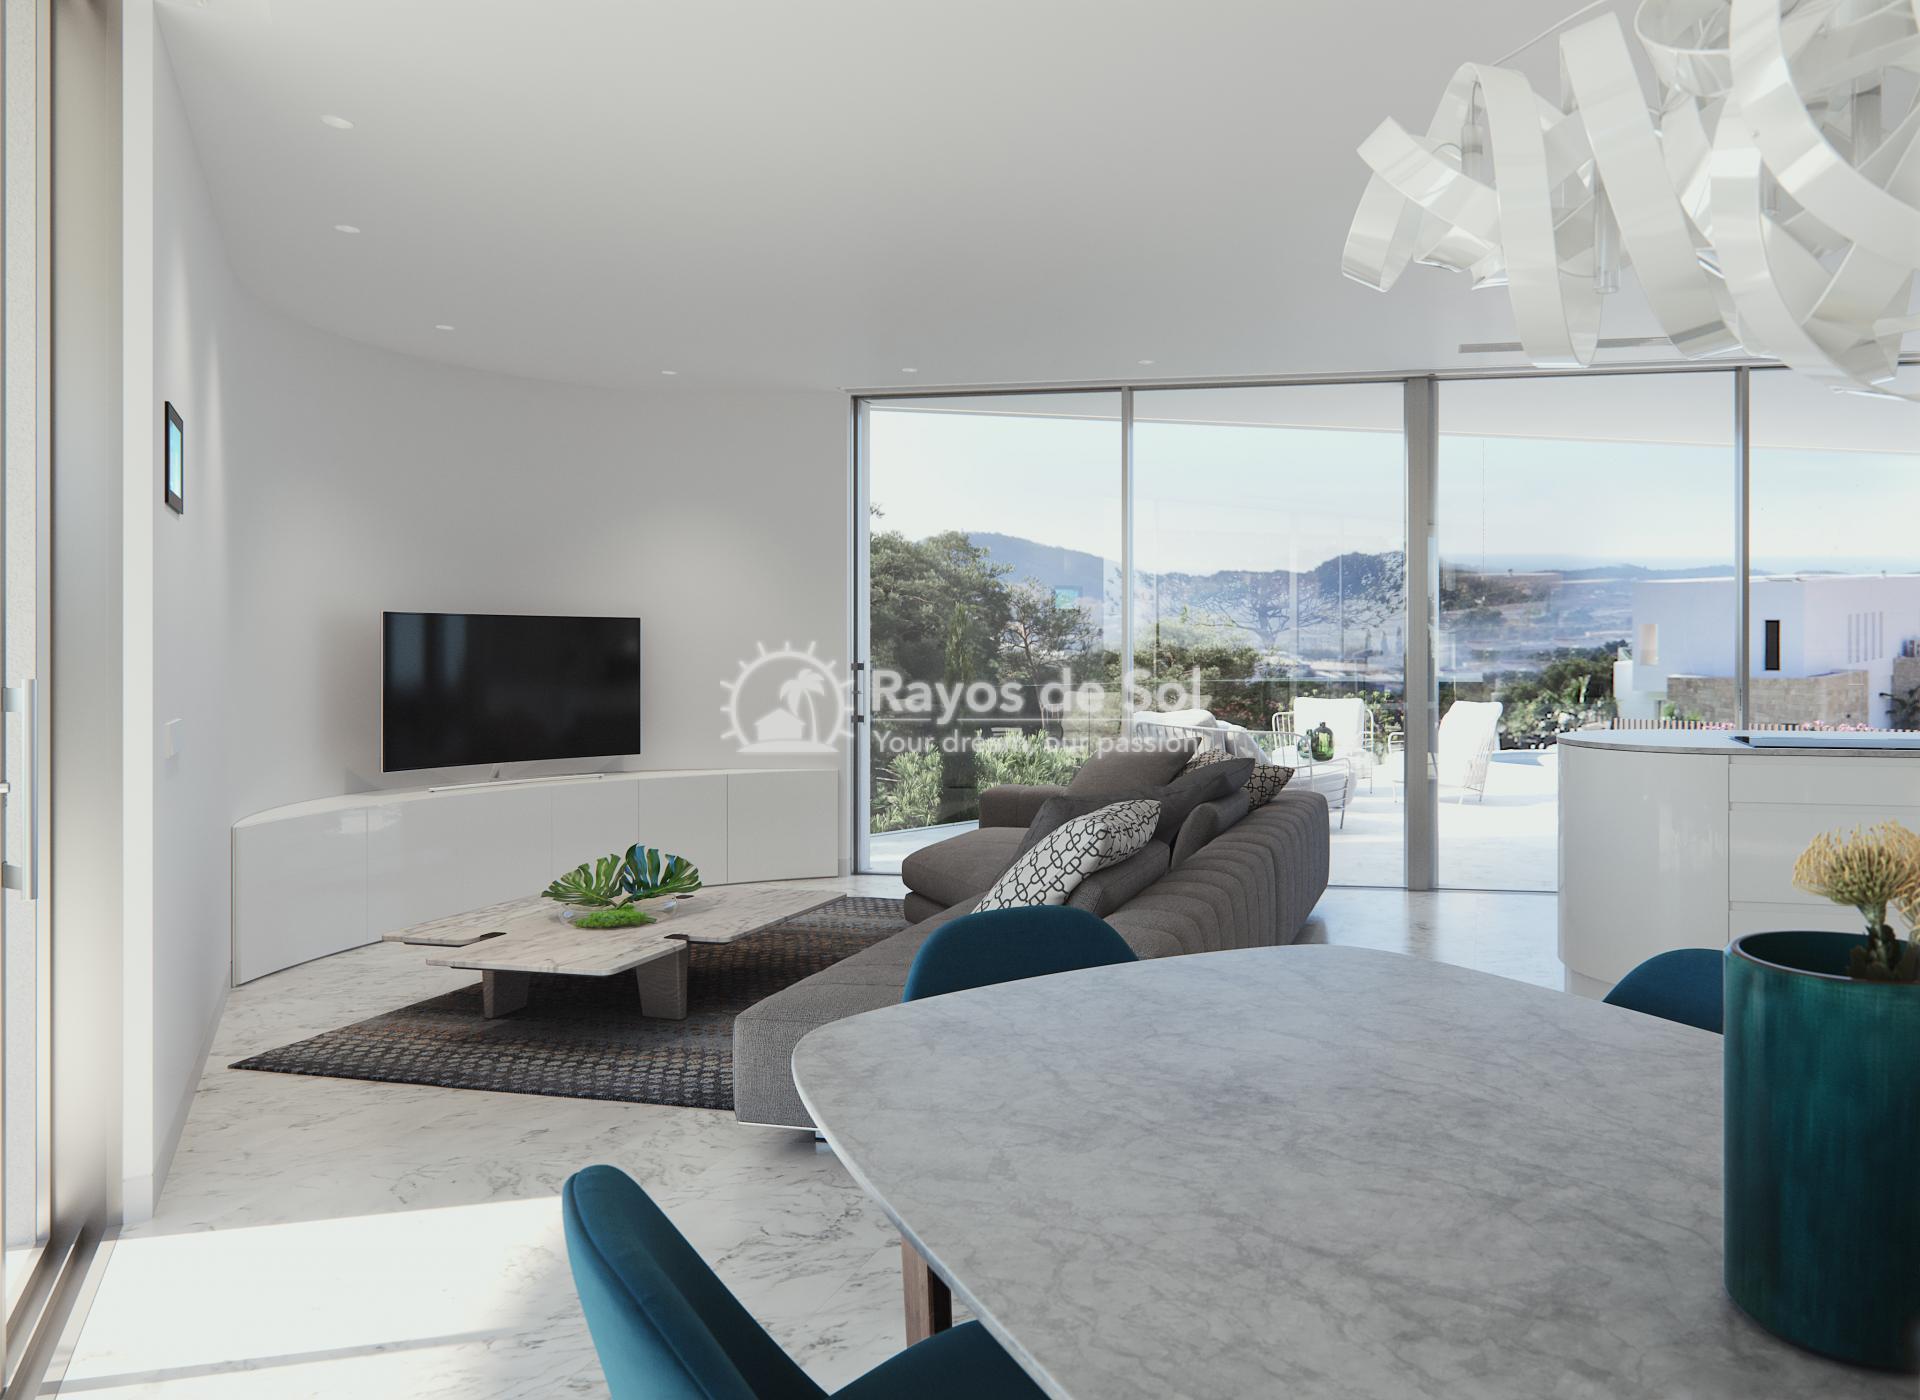 Stunning modern design villa  in Sierra Cortina, Finestrat, Costa Blanca (Praga 19) - 3